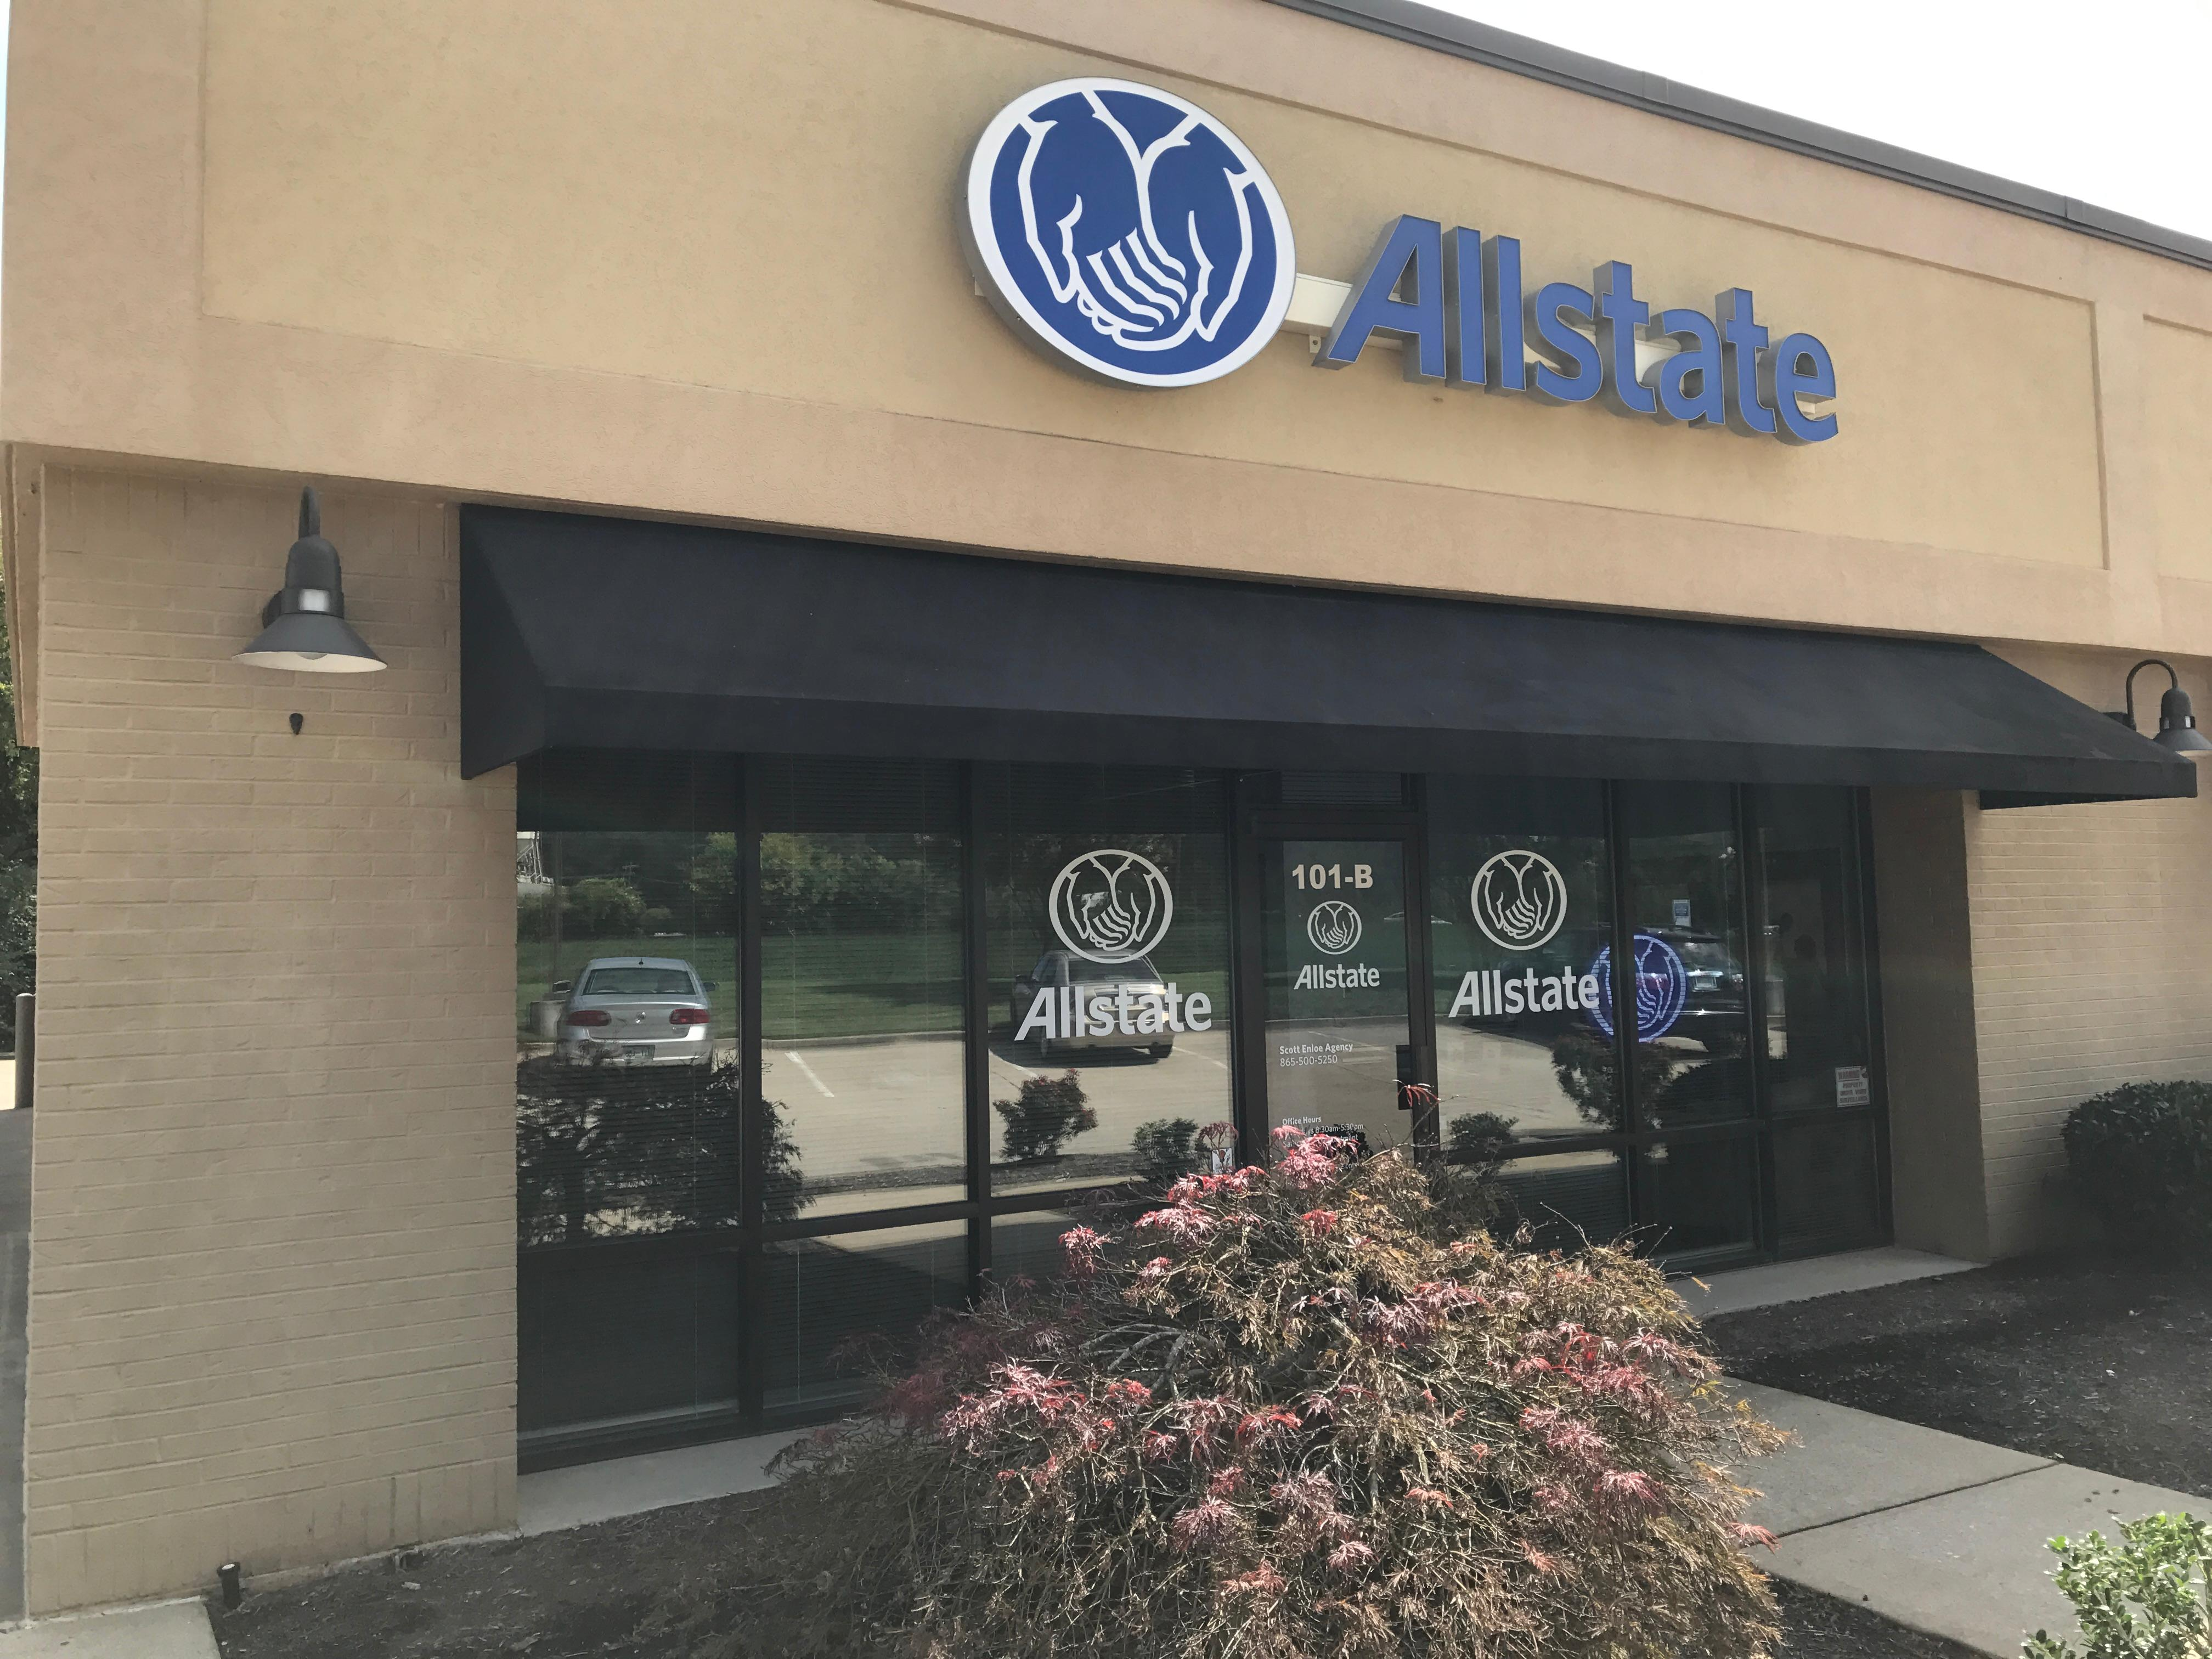 Allstate car insurance in knoxville tn scott enloe for Allstate motor club hotel discounts